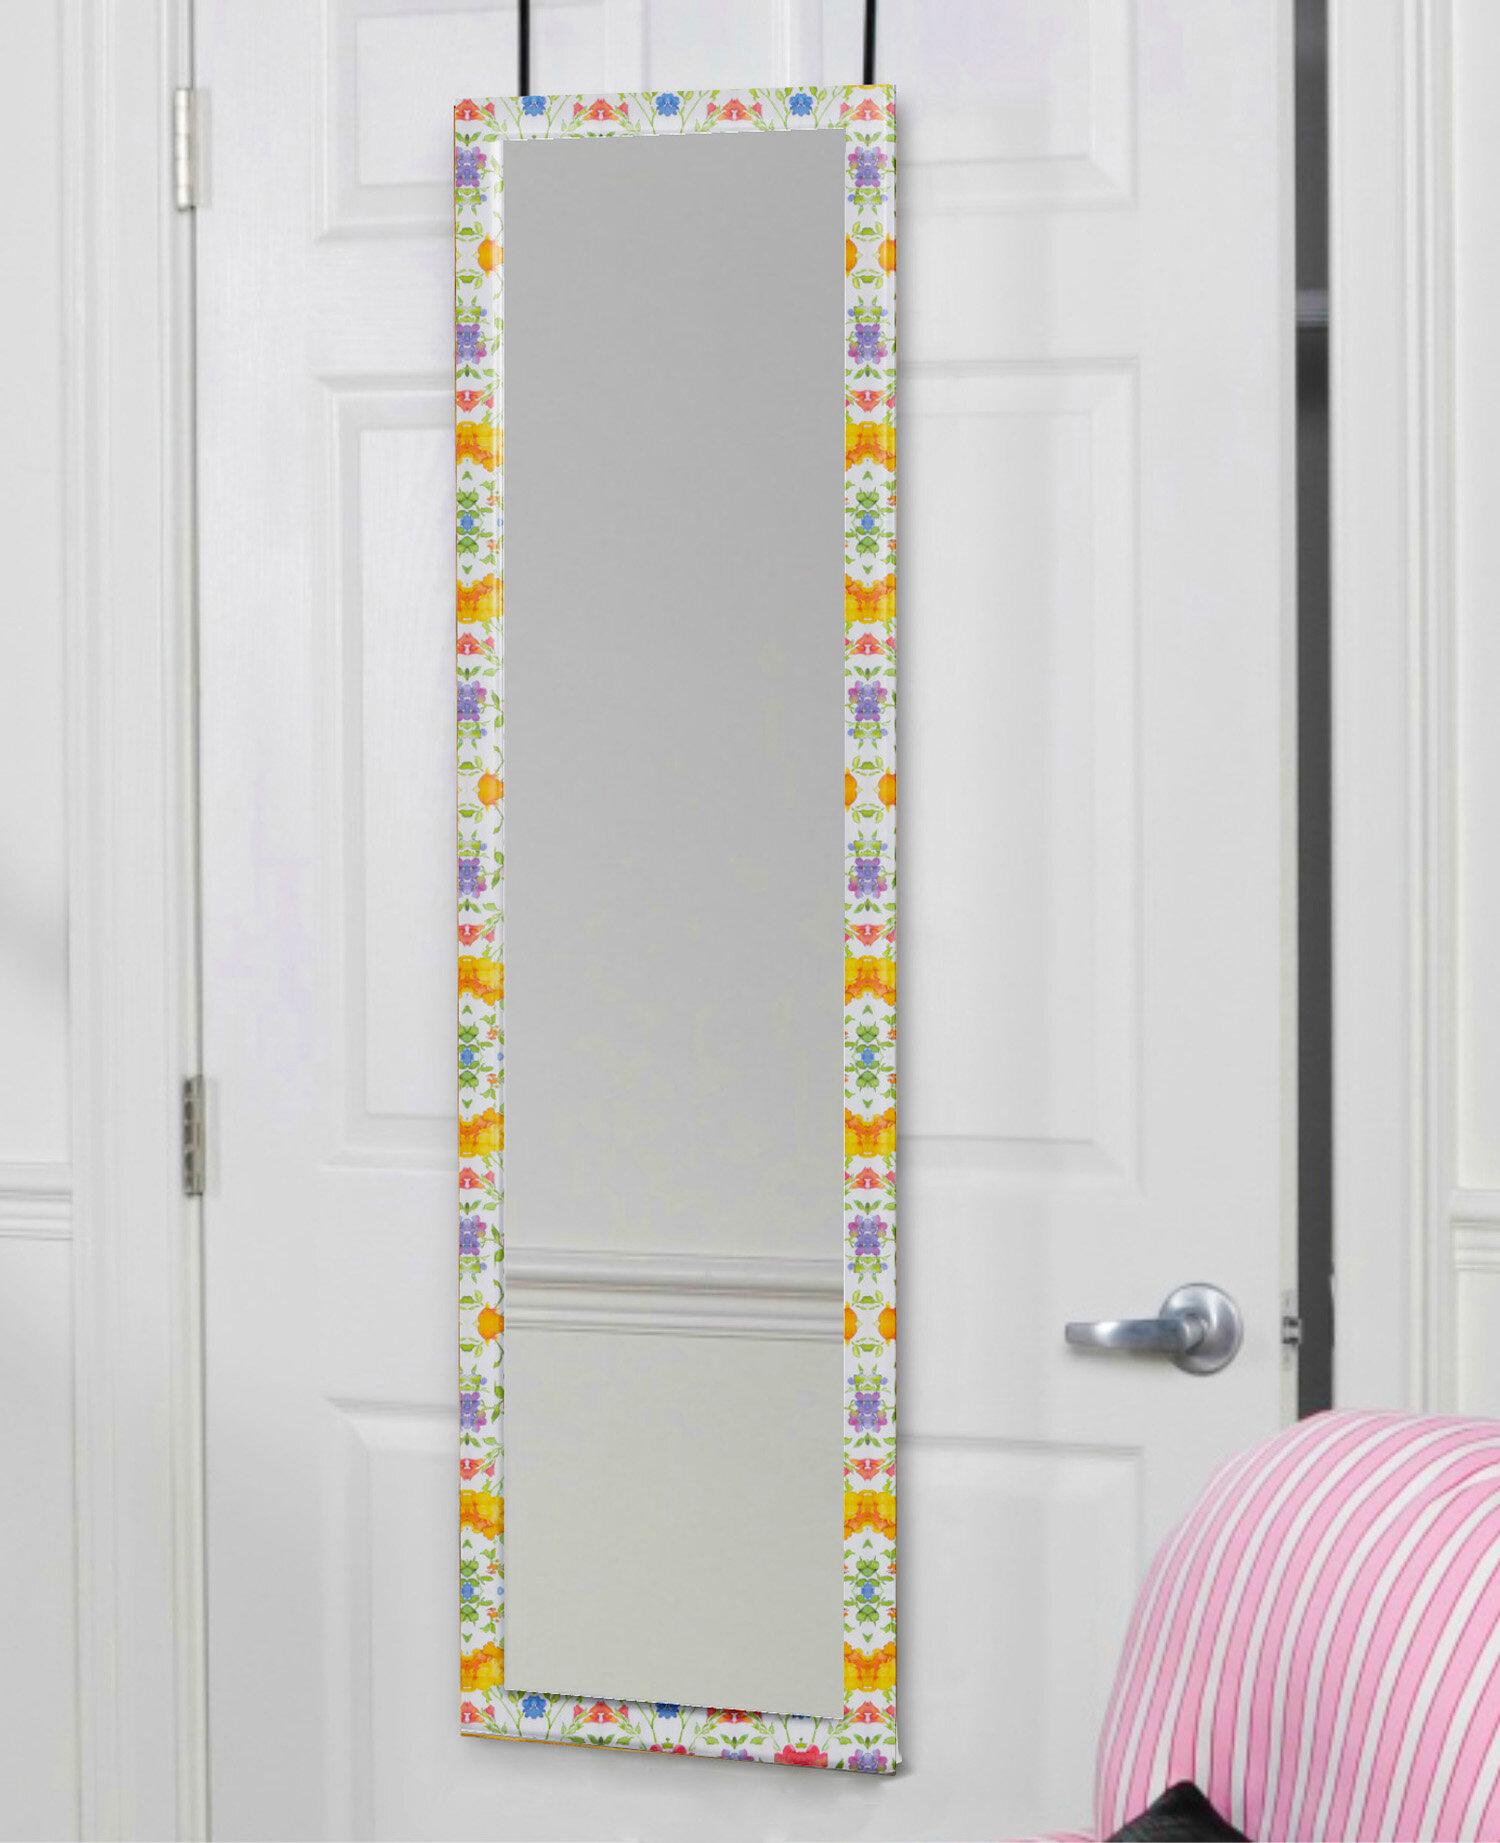 Mirrotek Over The Door Full Length Mirror U0026 Reviews | Wayfair